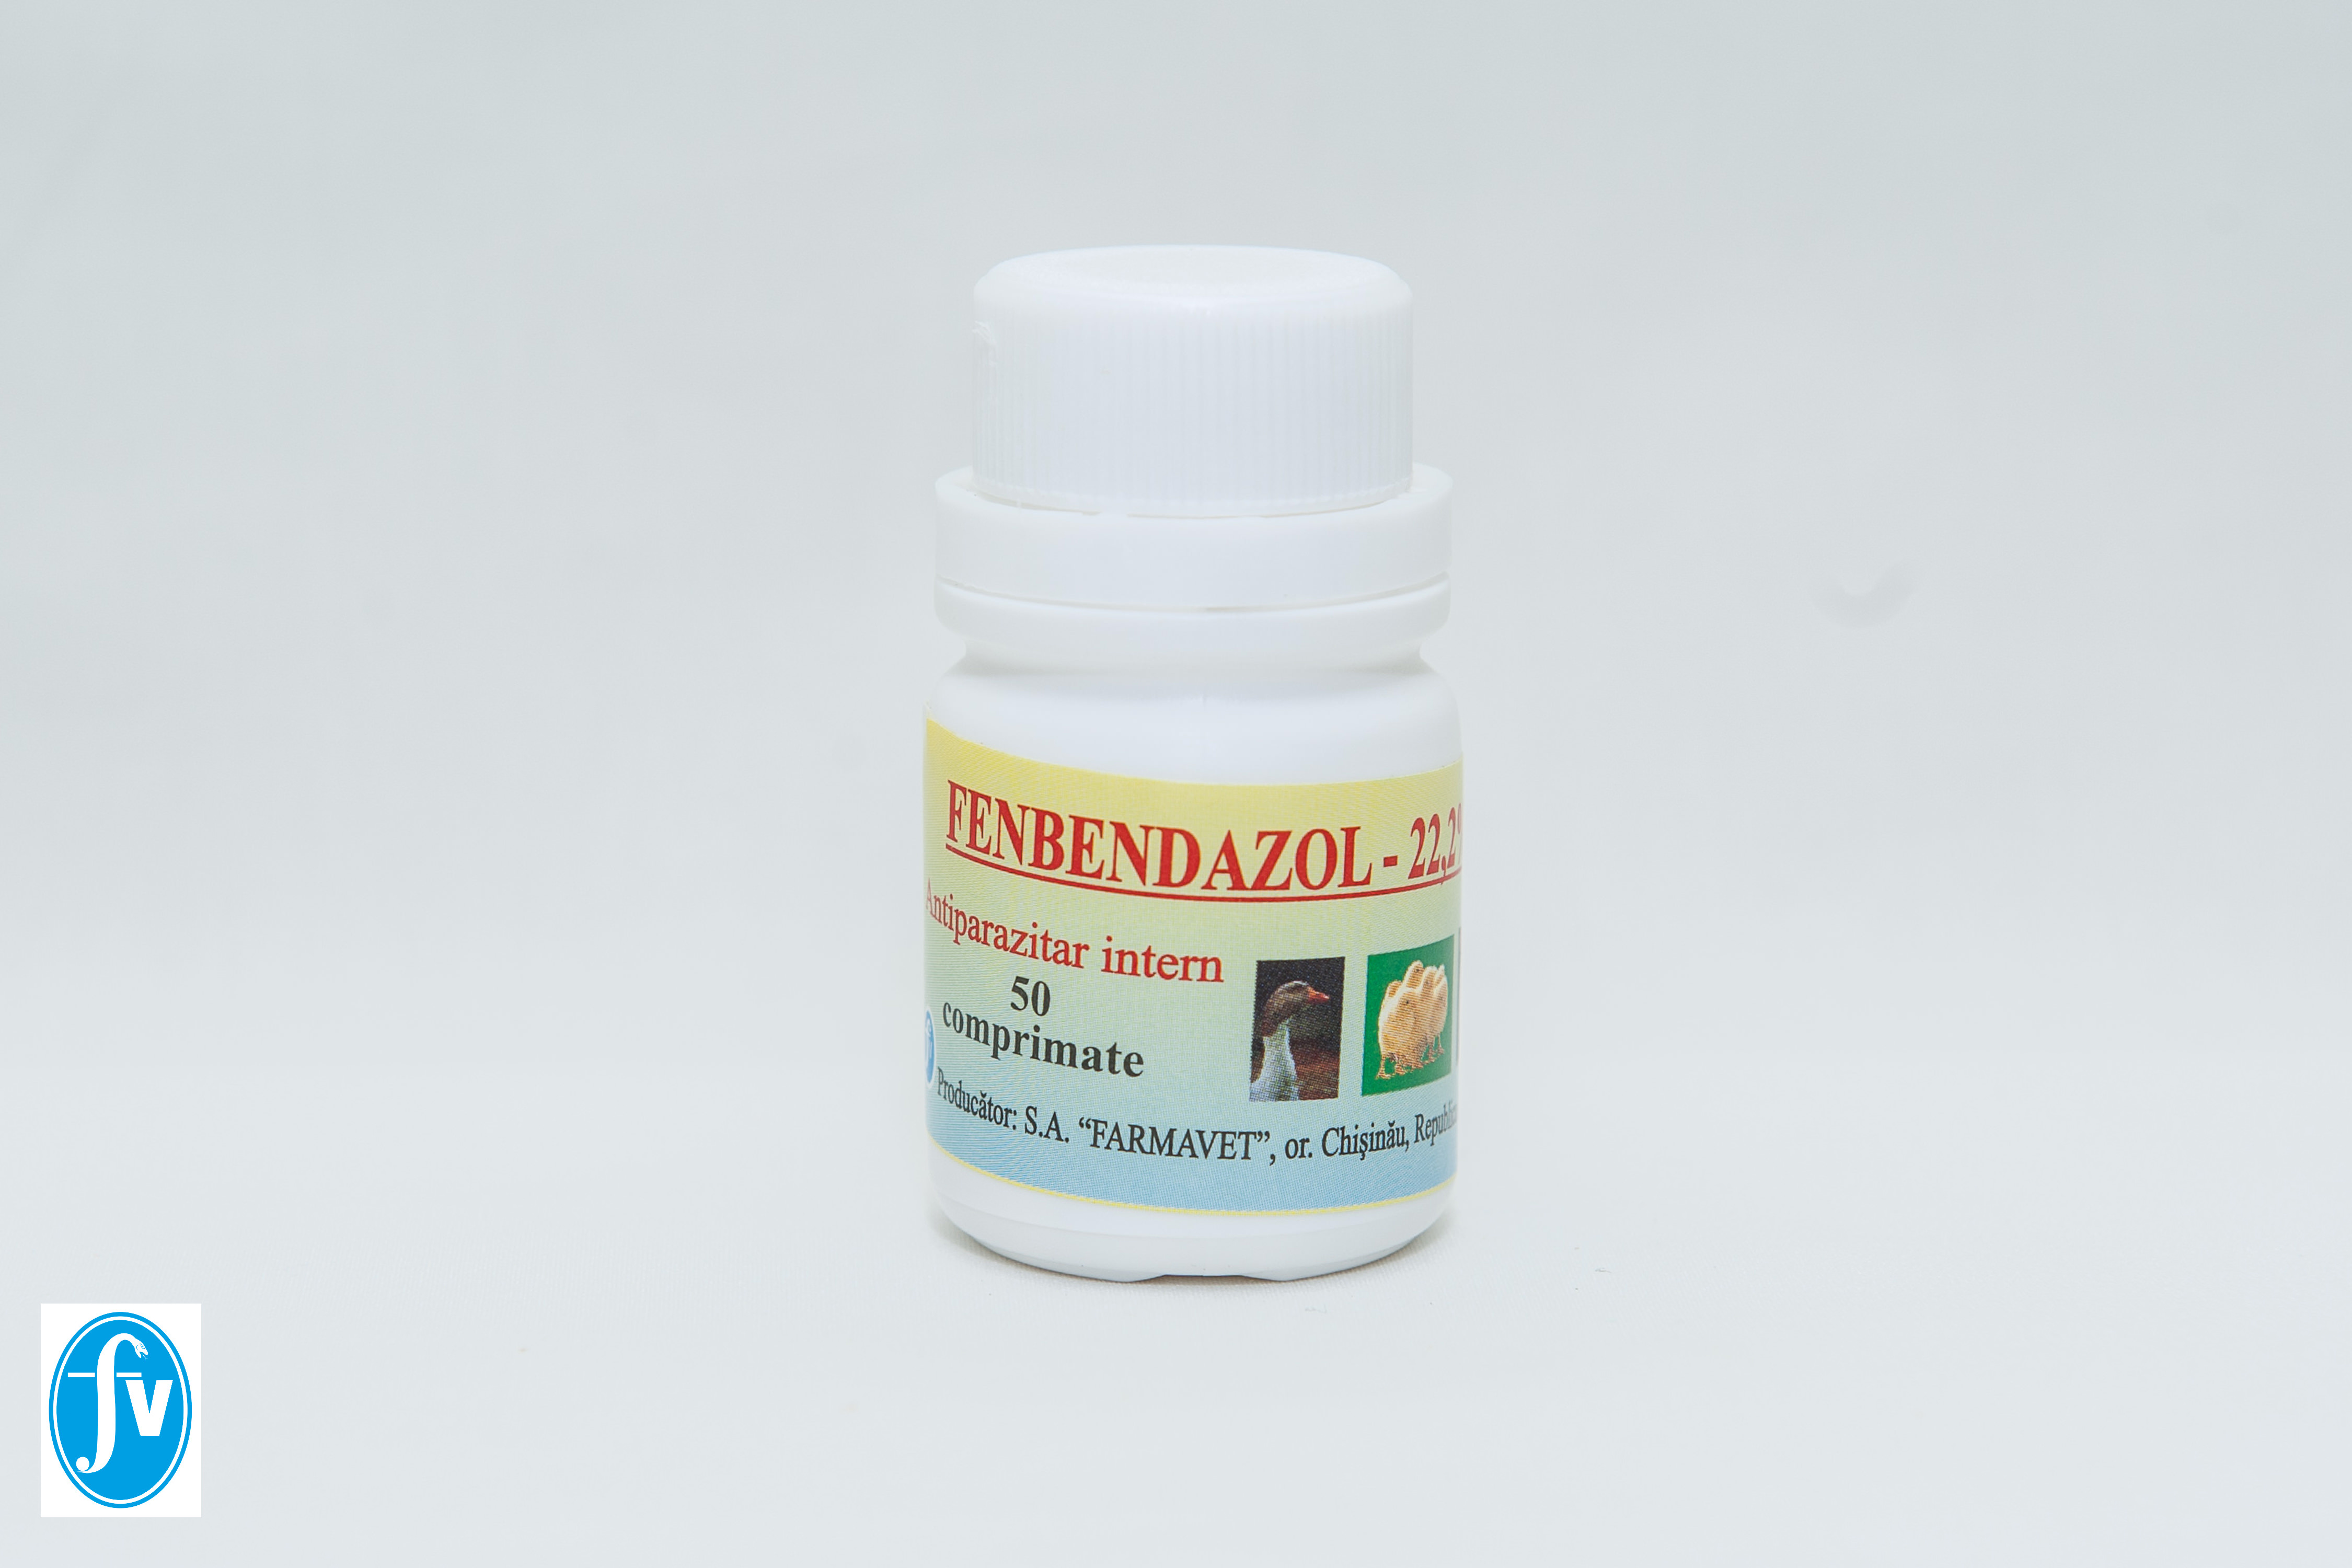 medicament eficient împotriva helminților